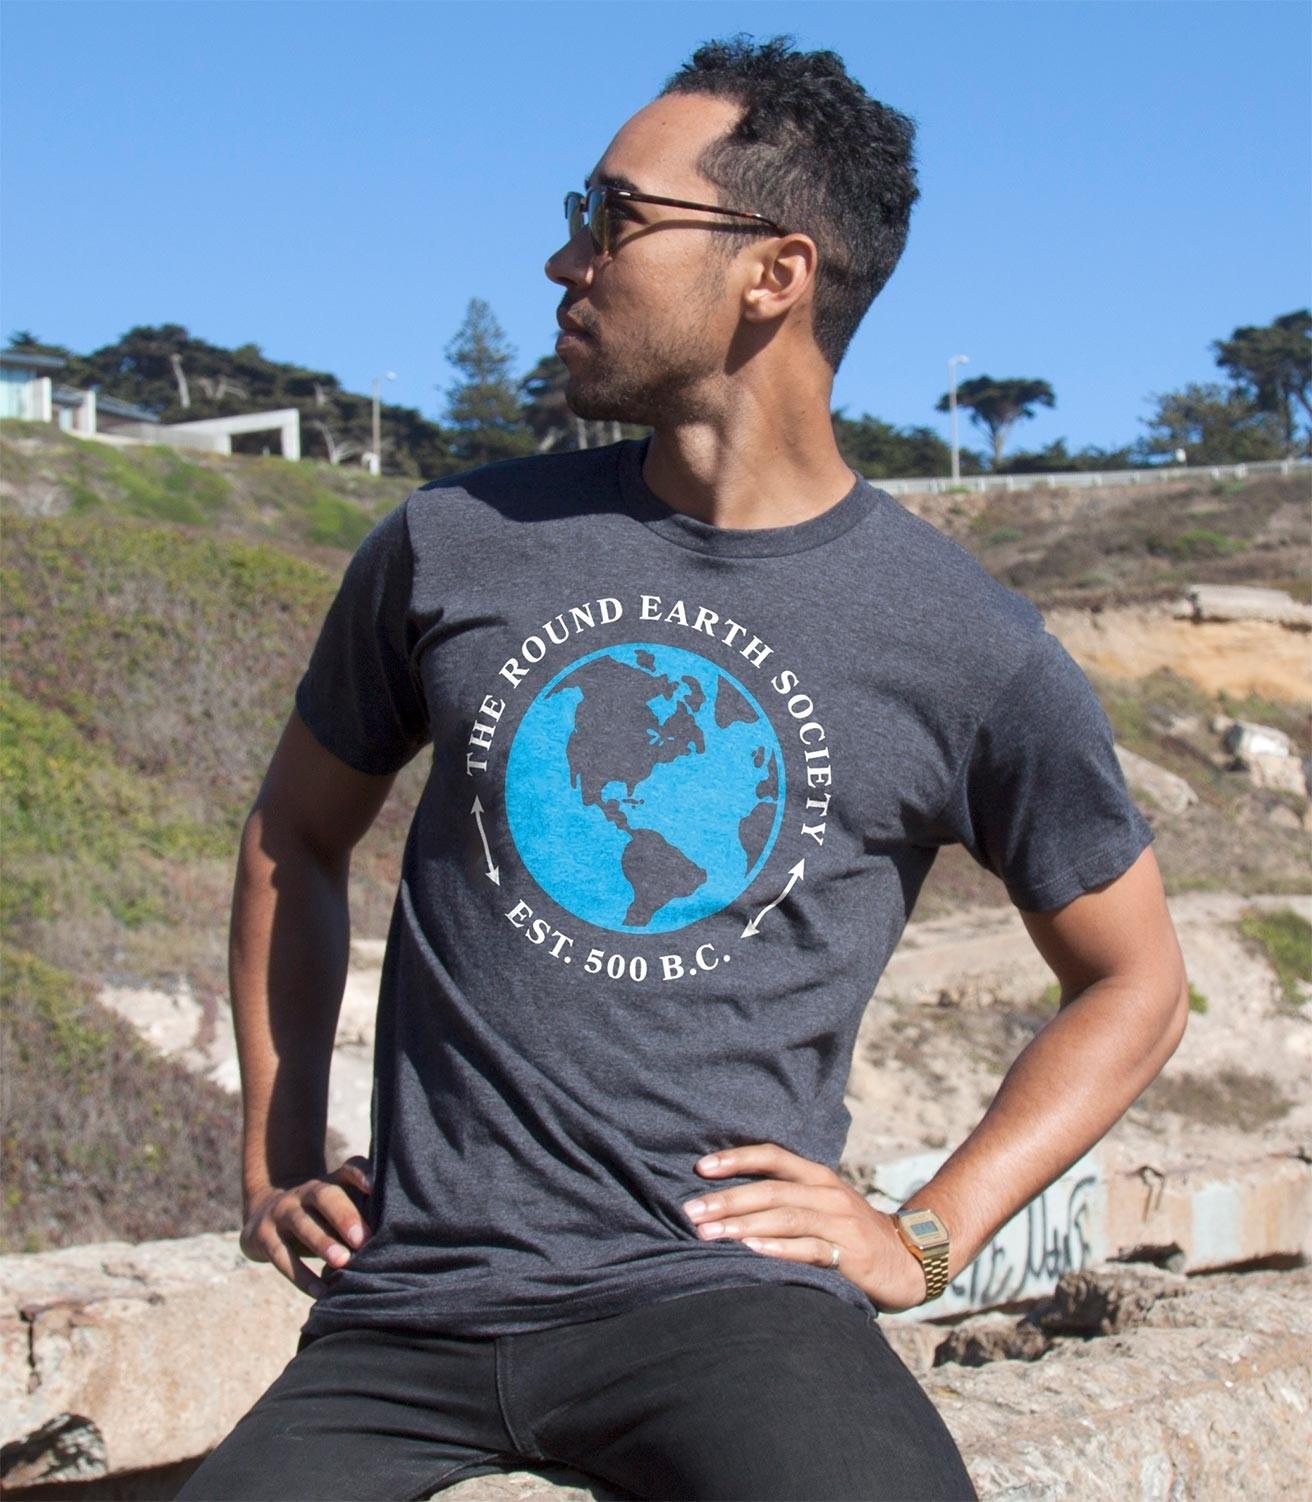 7b3cb564 Round Earth Society Funny Men's Cotton/Poly T-Shirt   Headline Shirts